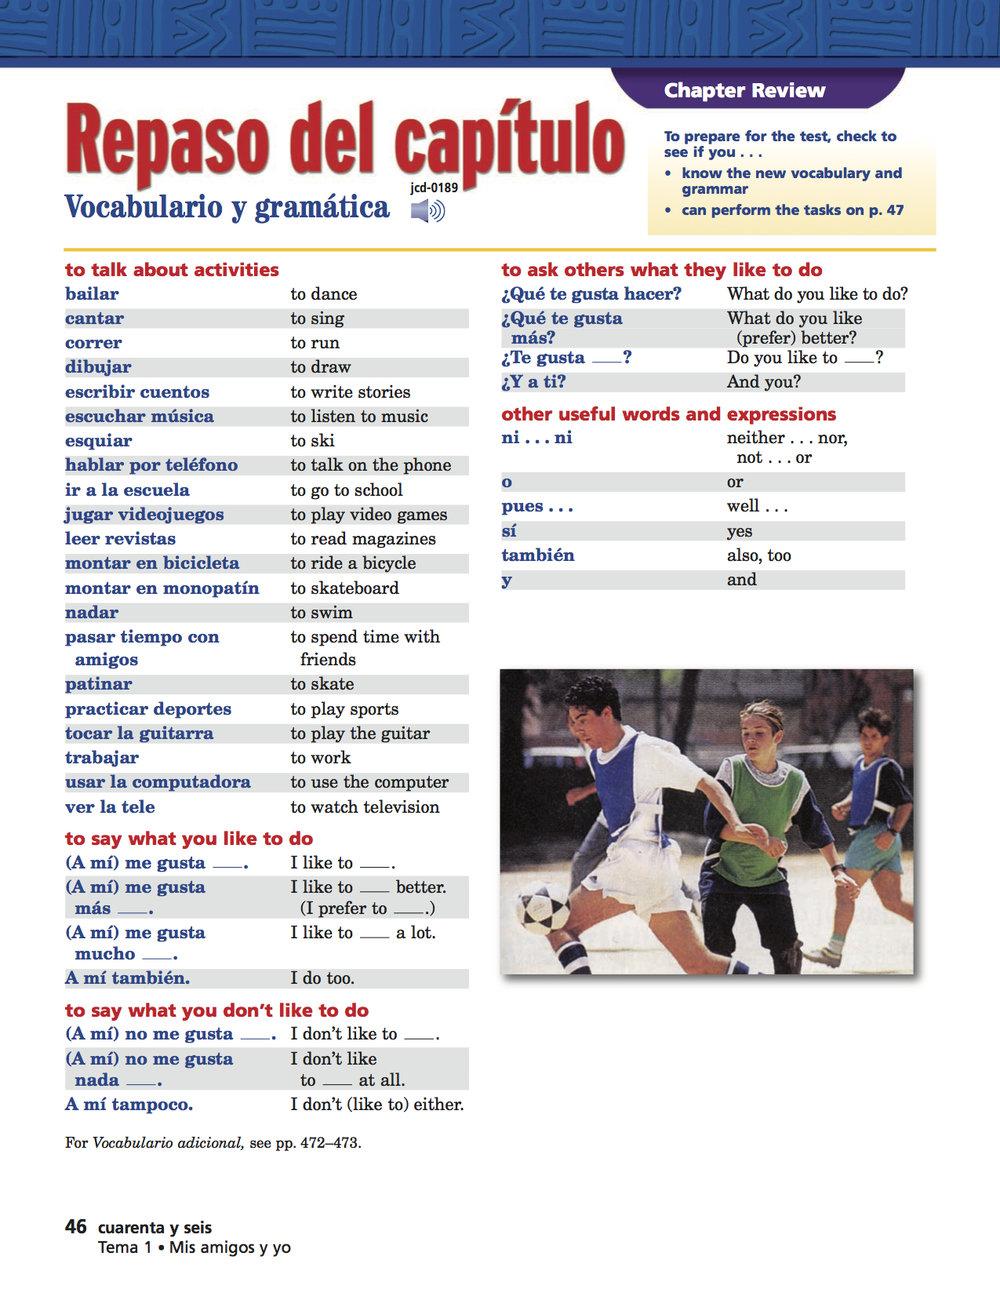 L1_Capitulo_1A copia.jpg